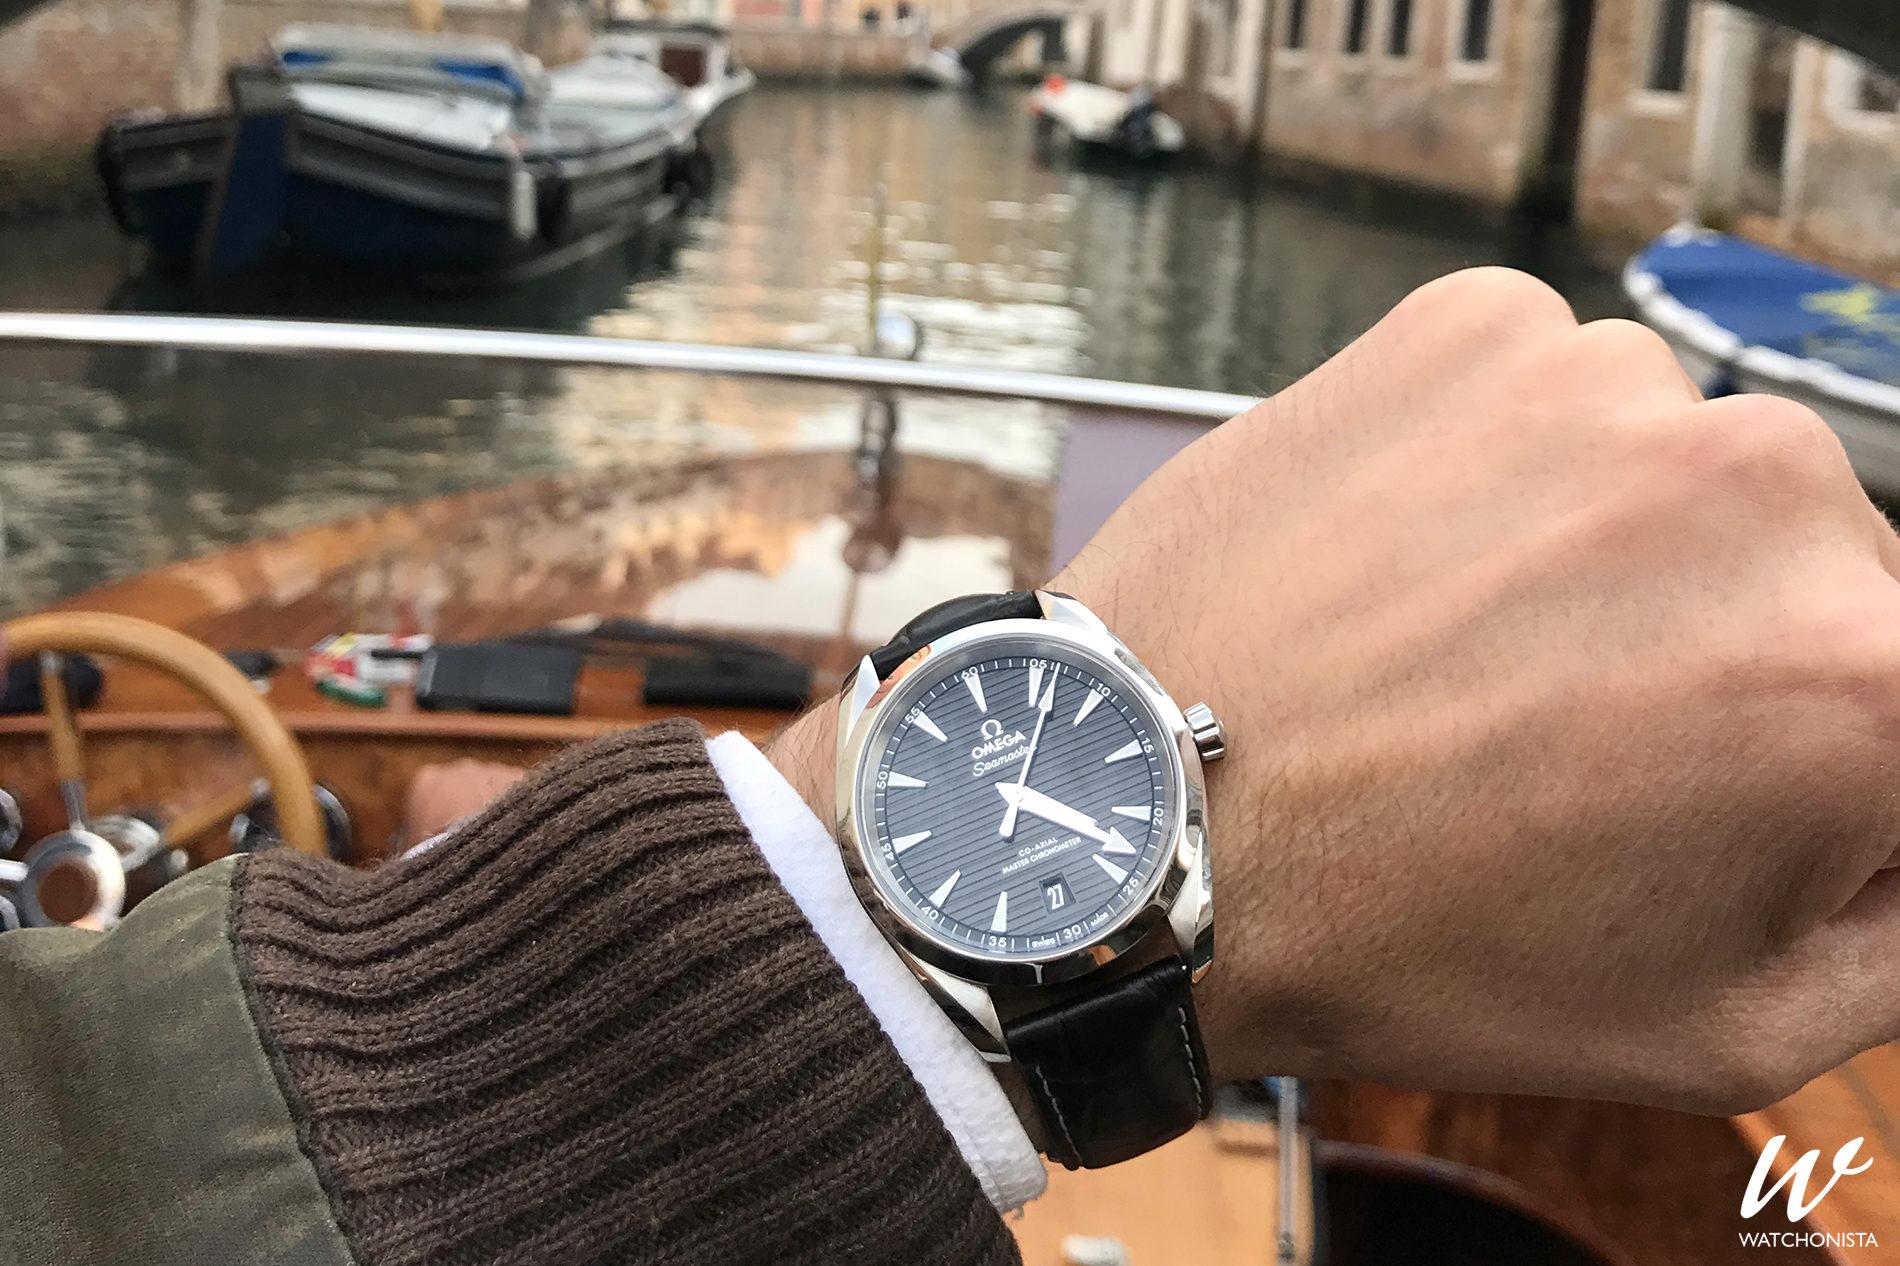 dfddae7ba0b OMEGA Seamaster Aqua Terra  How to Reconcile Sportiness and Elegance ...